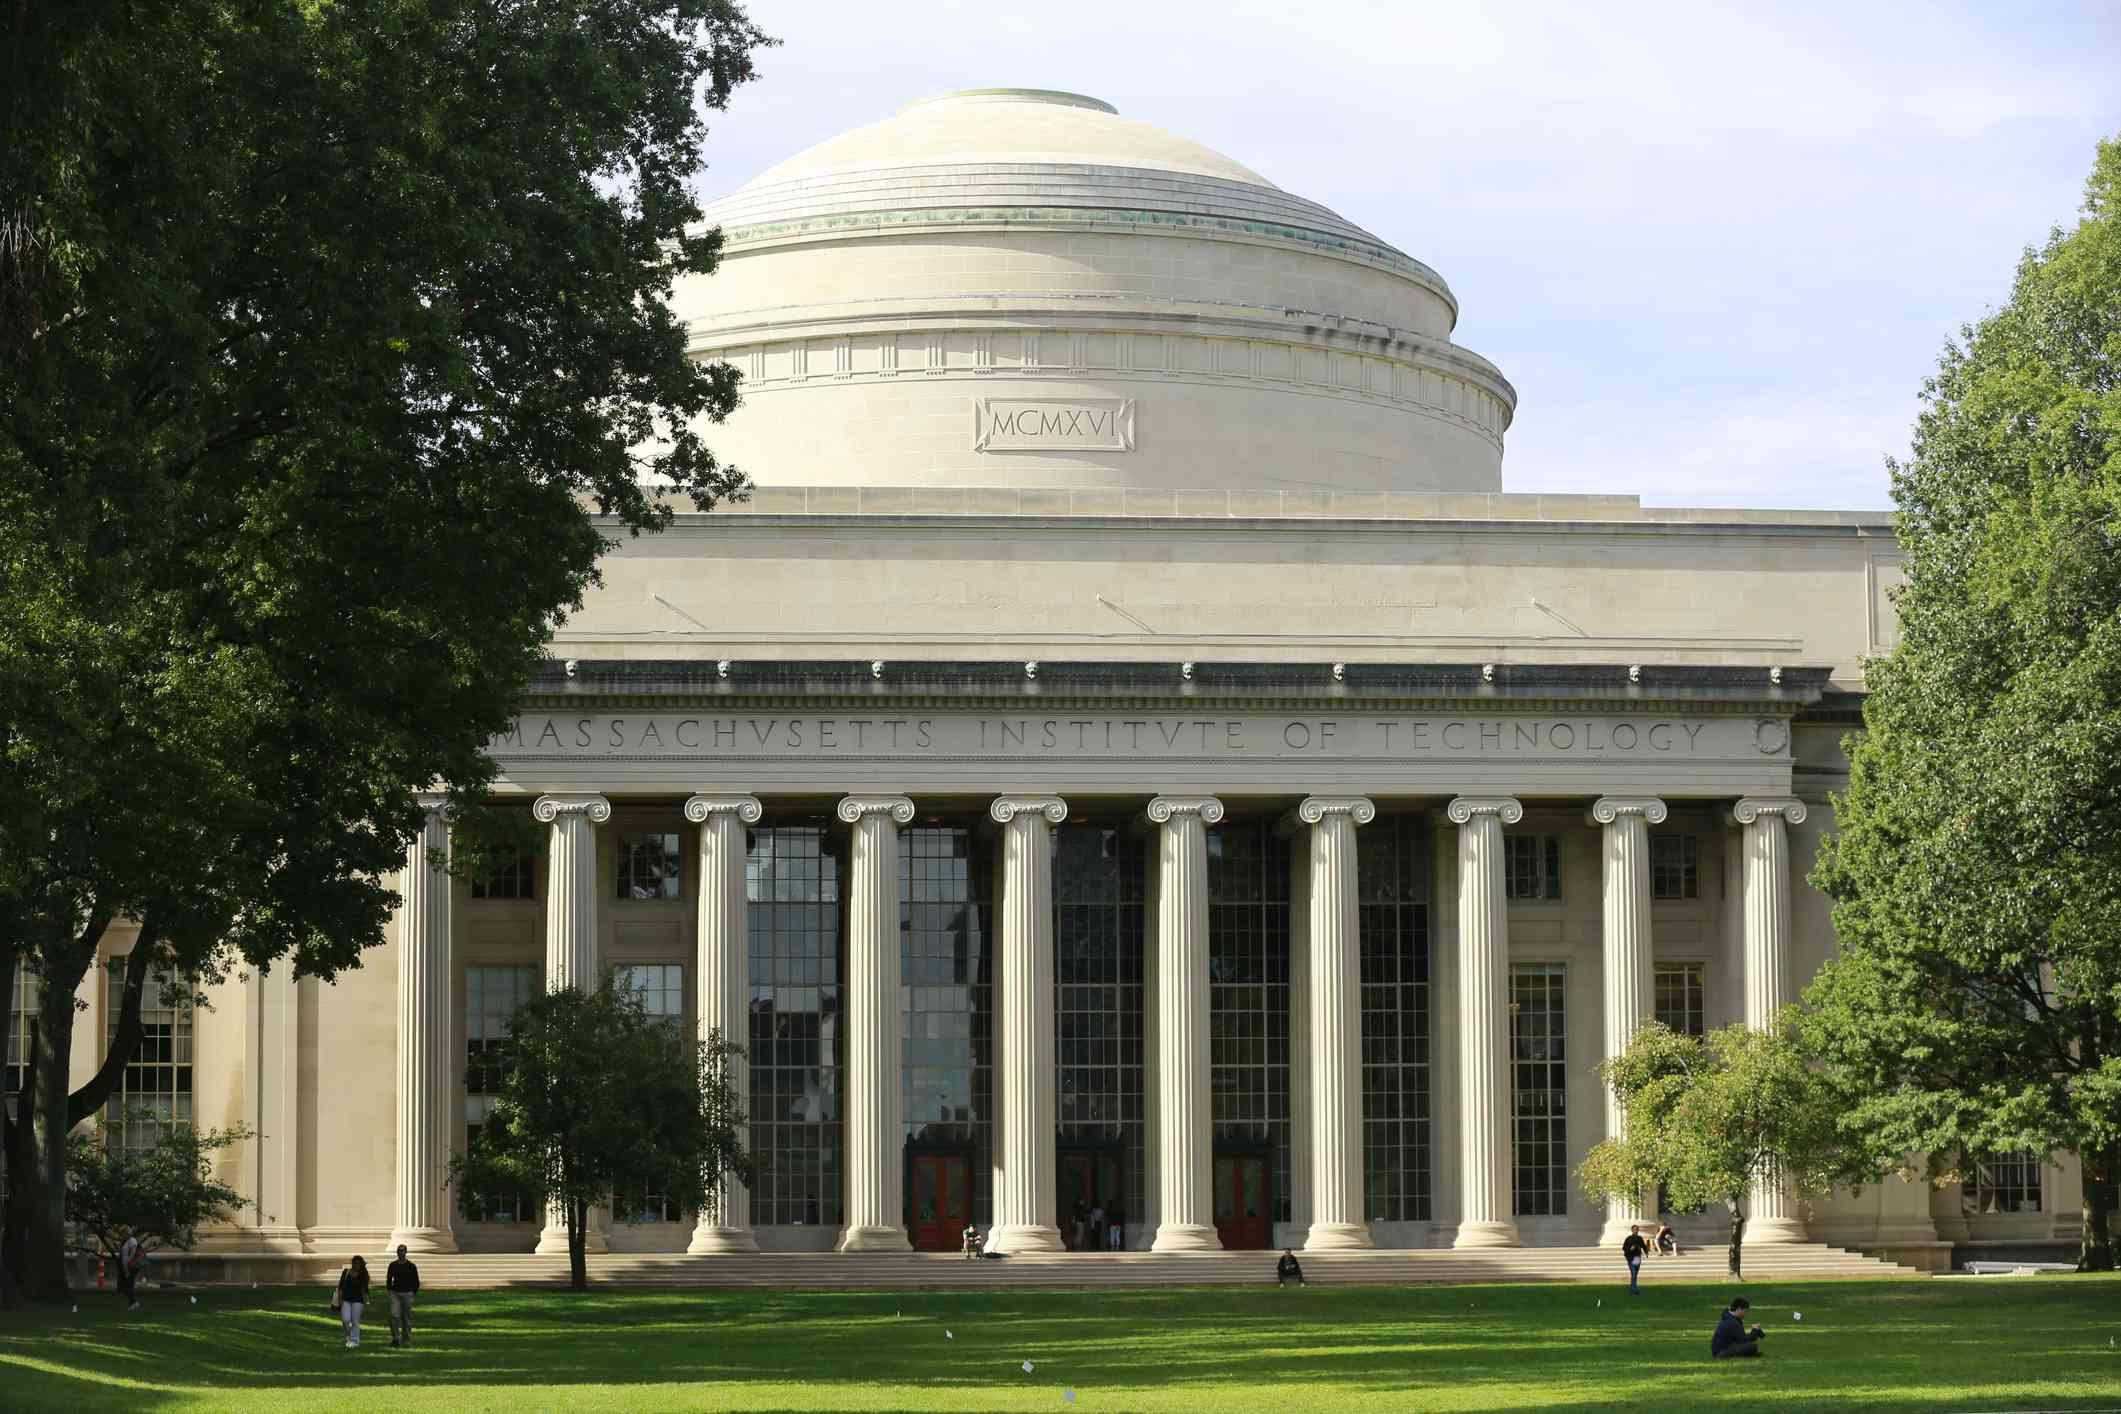 Instituto de Tecnología de Massachusetts